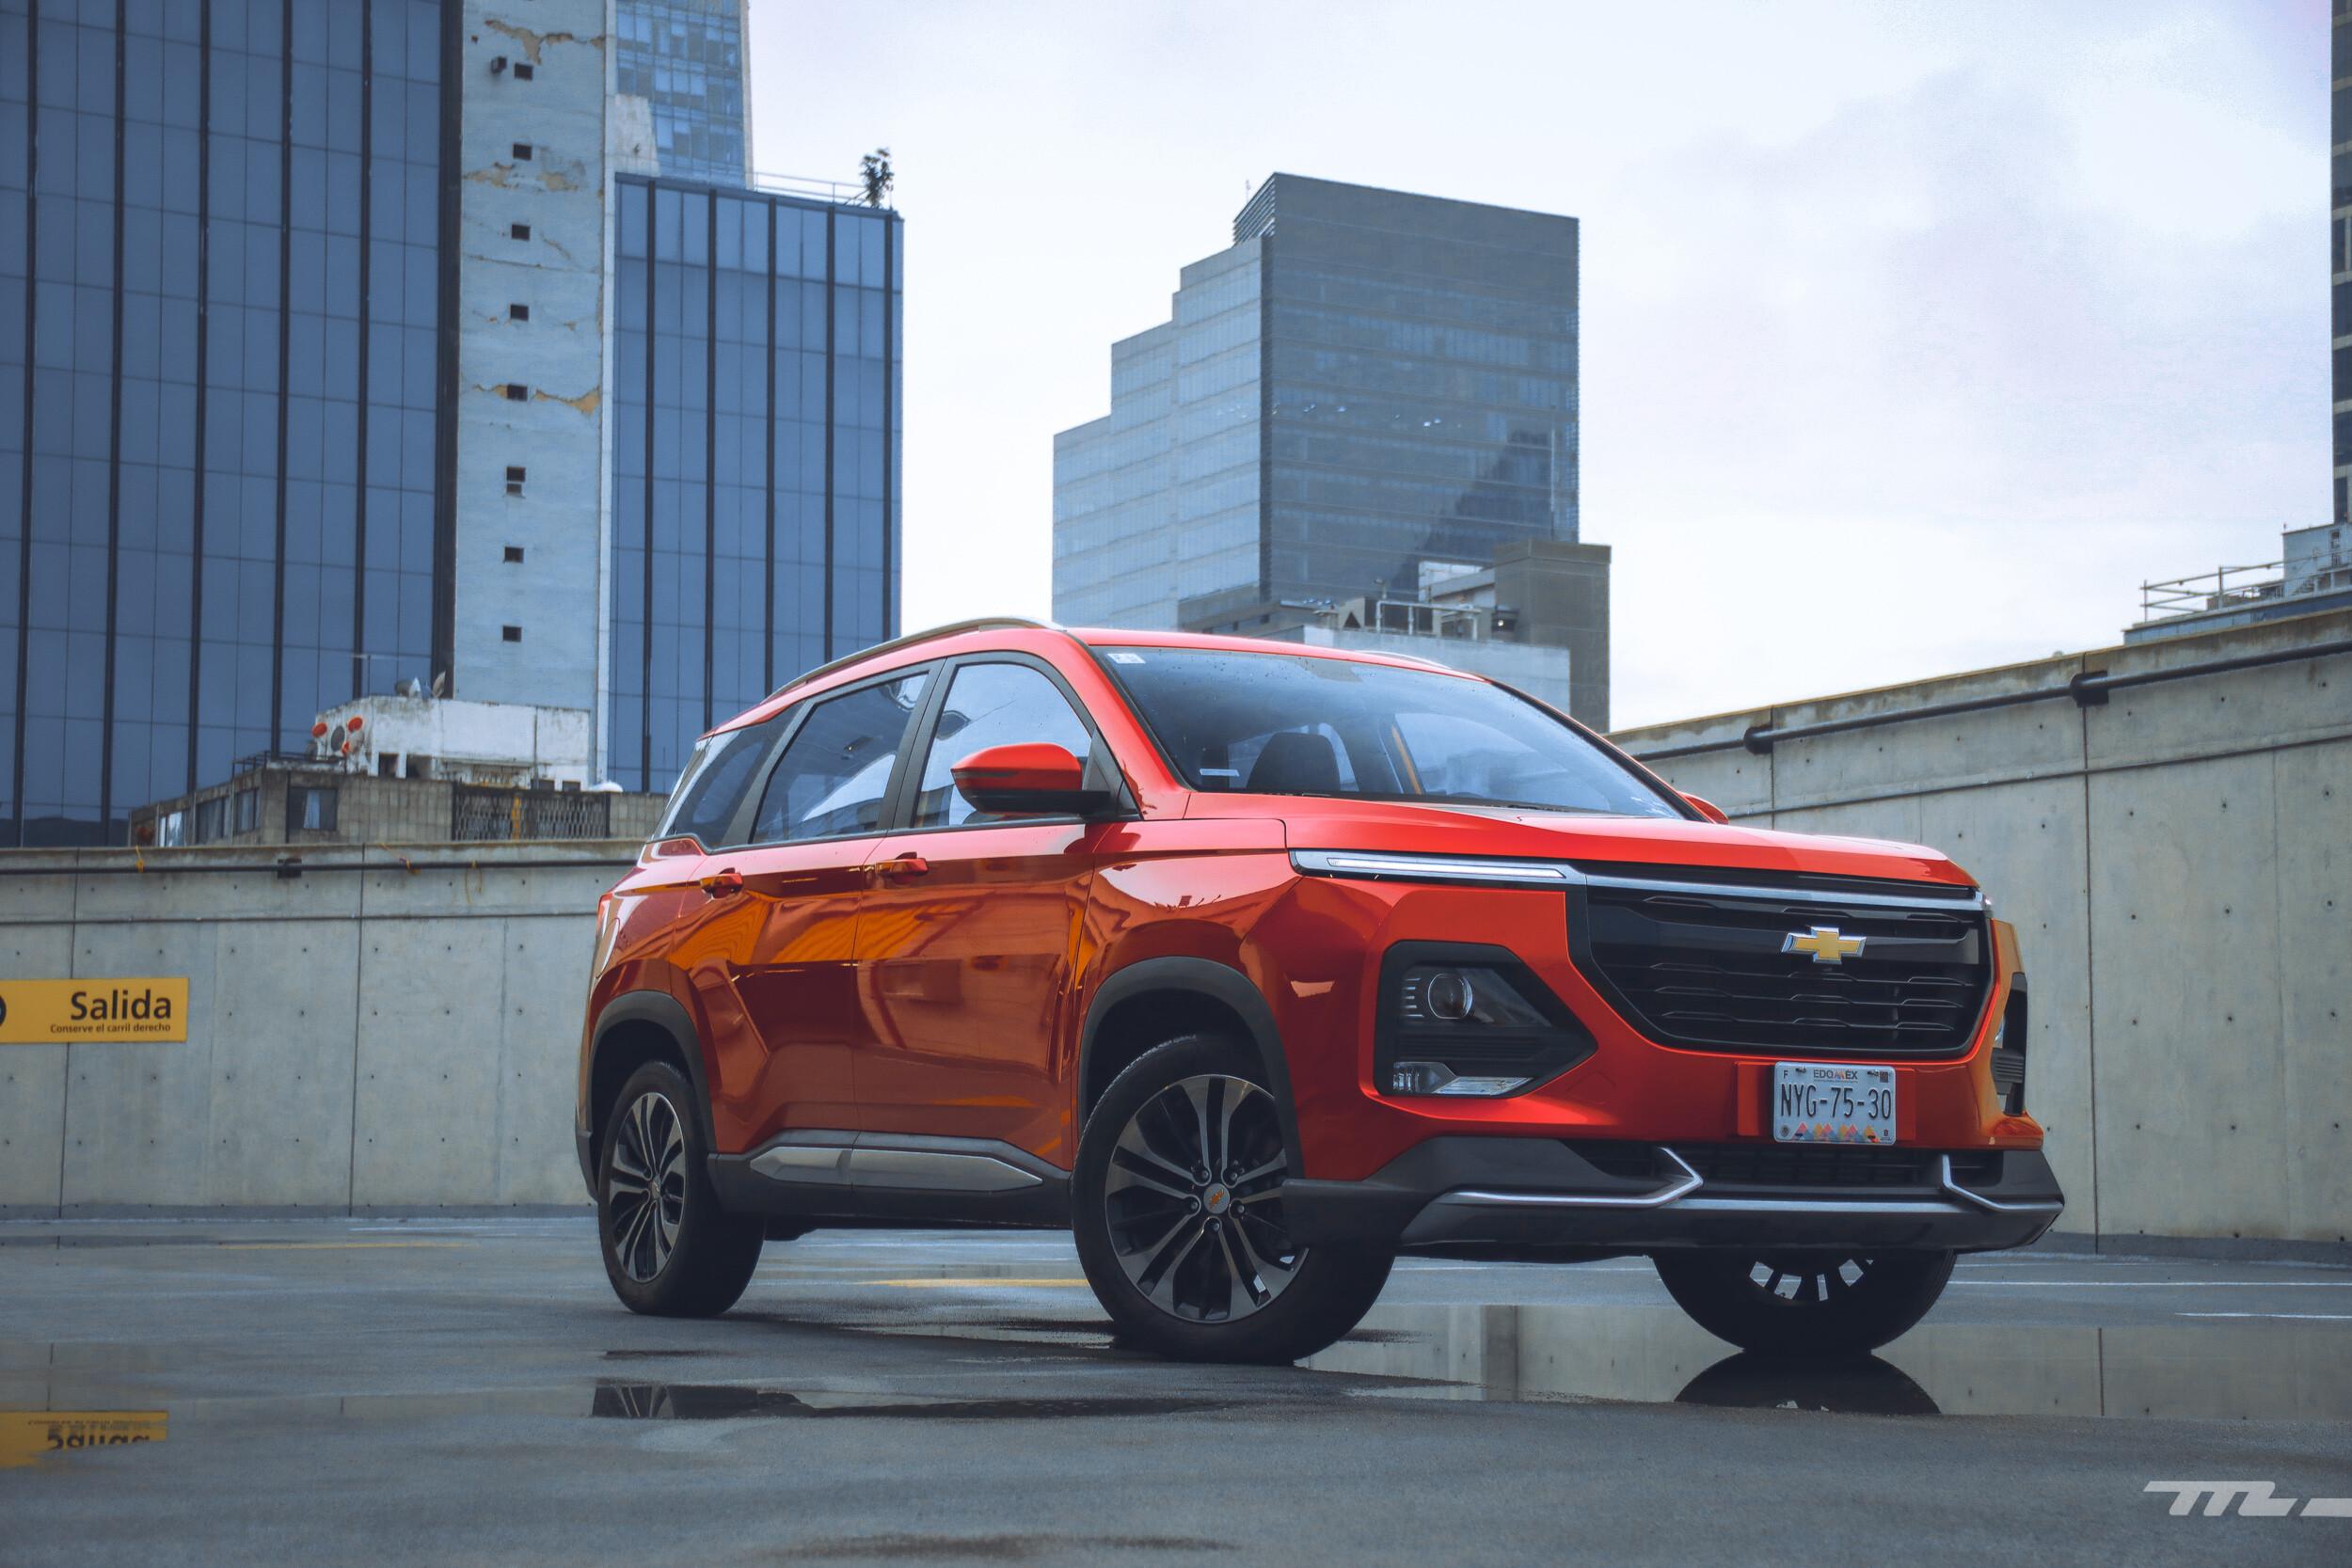 Foto de Chevrolet Captiva 2022 (2/54)